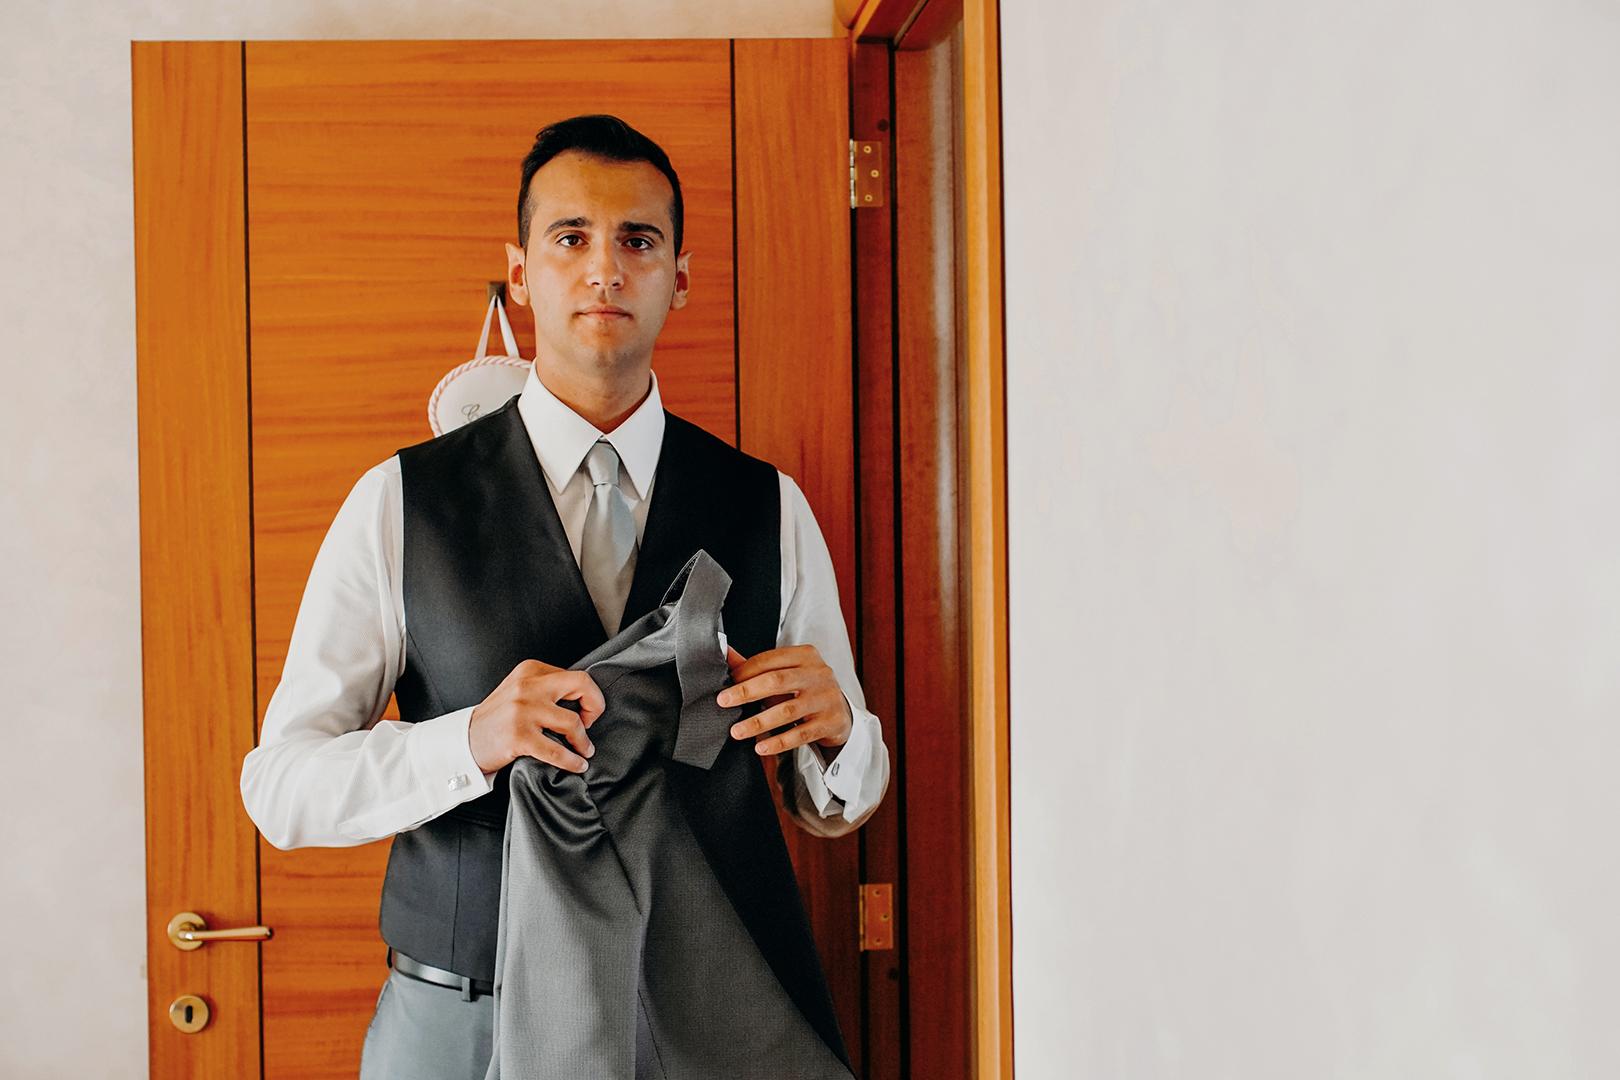 14 gianni-lepore-sposo-groom-casa-abito-uomo-preparativi-lucera-testimoni-geova